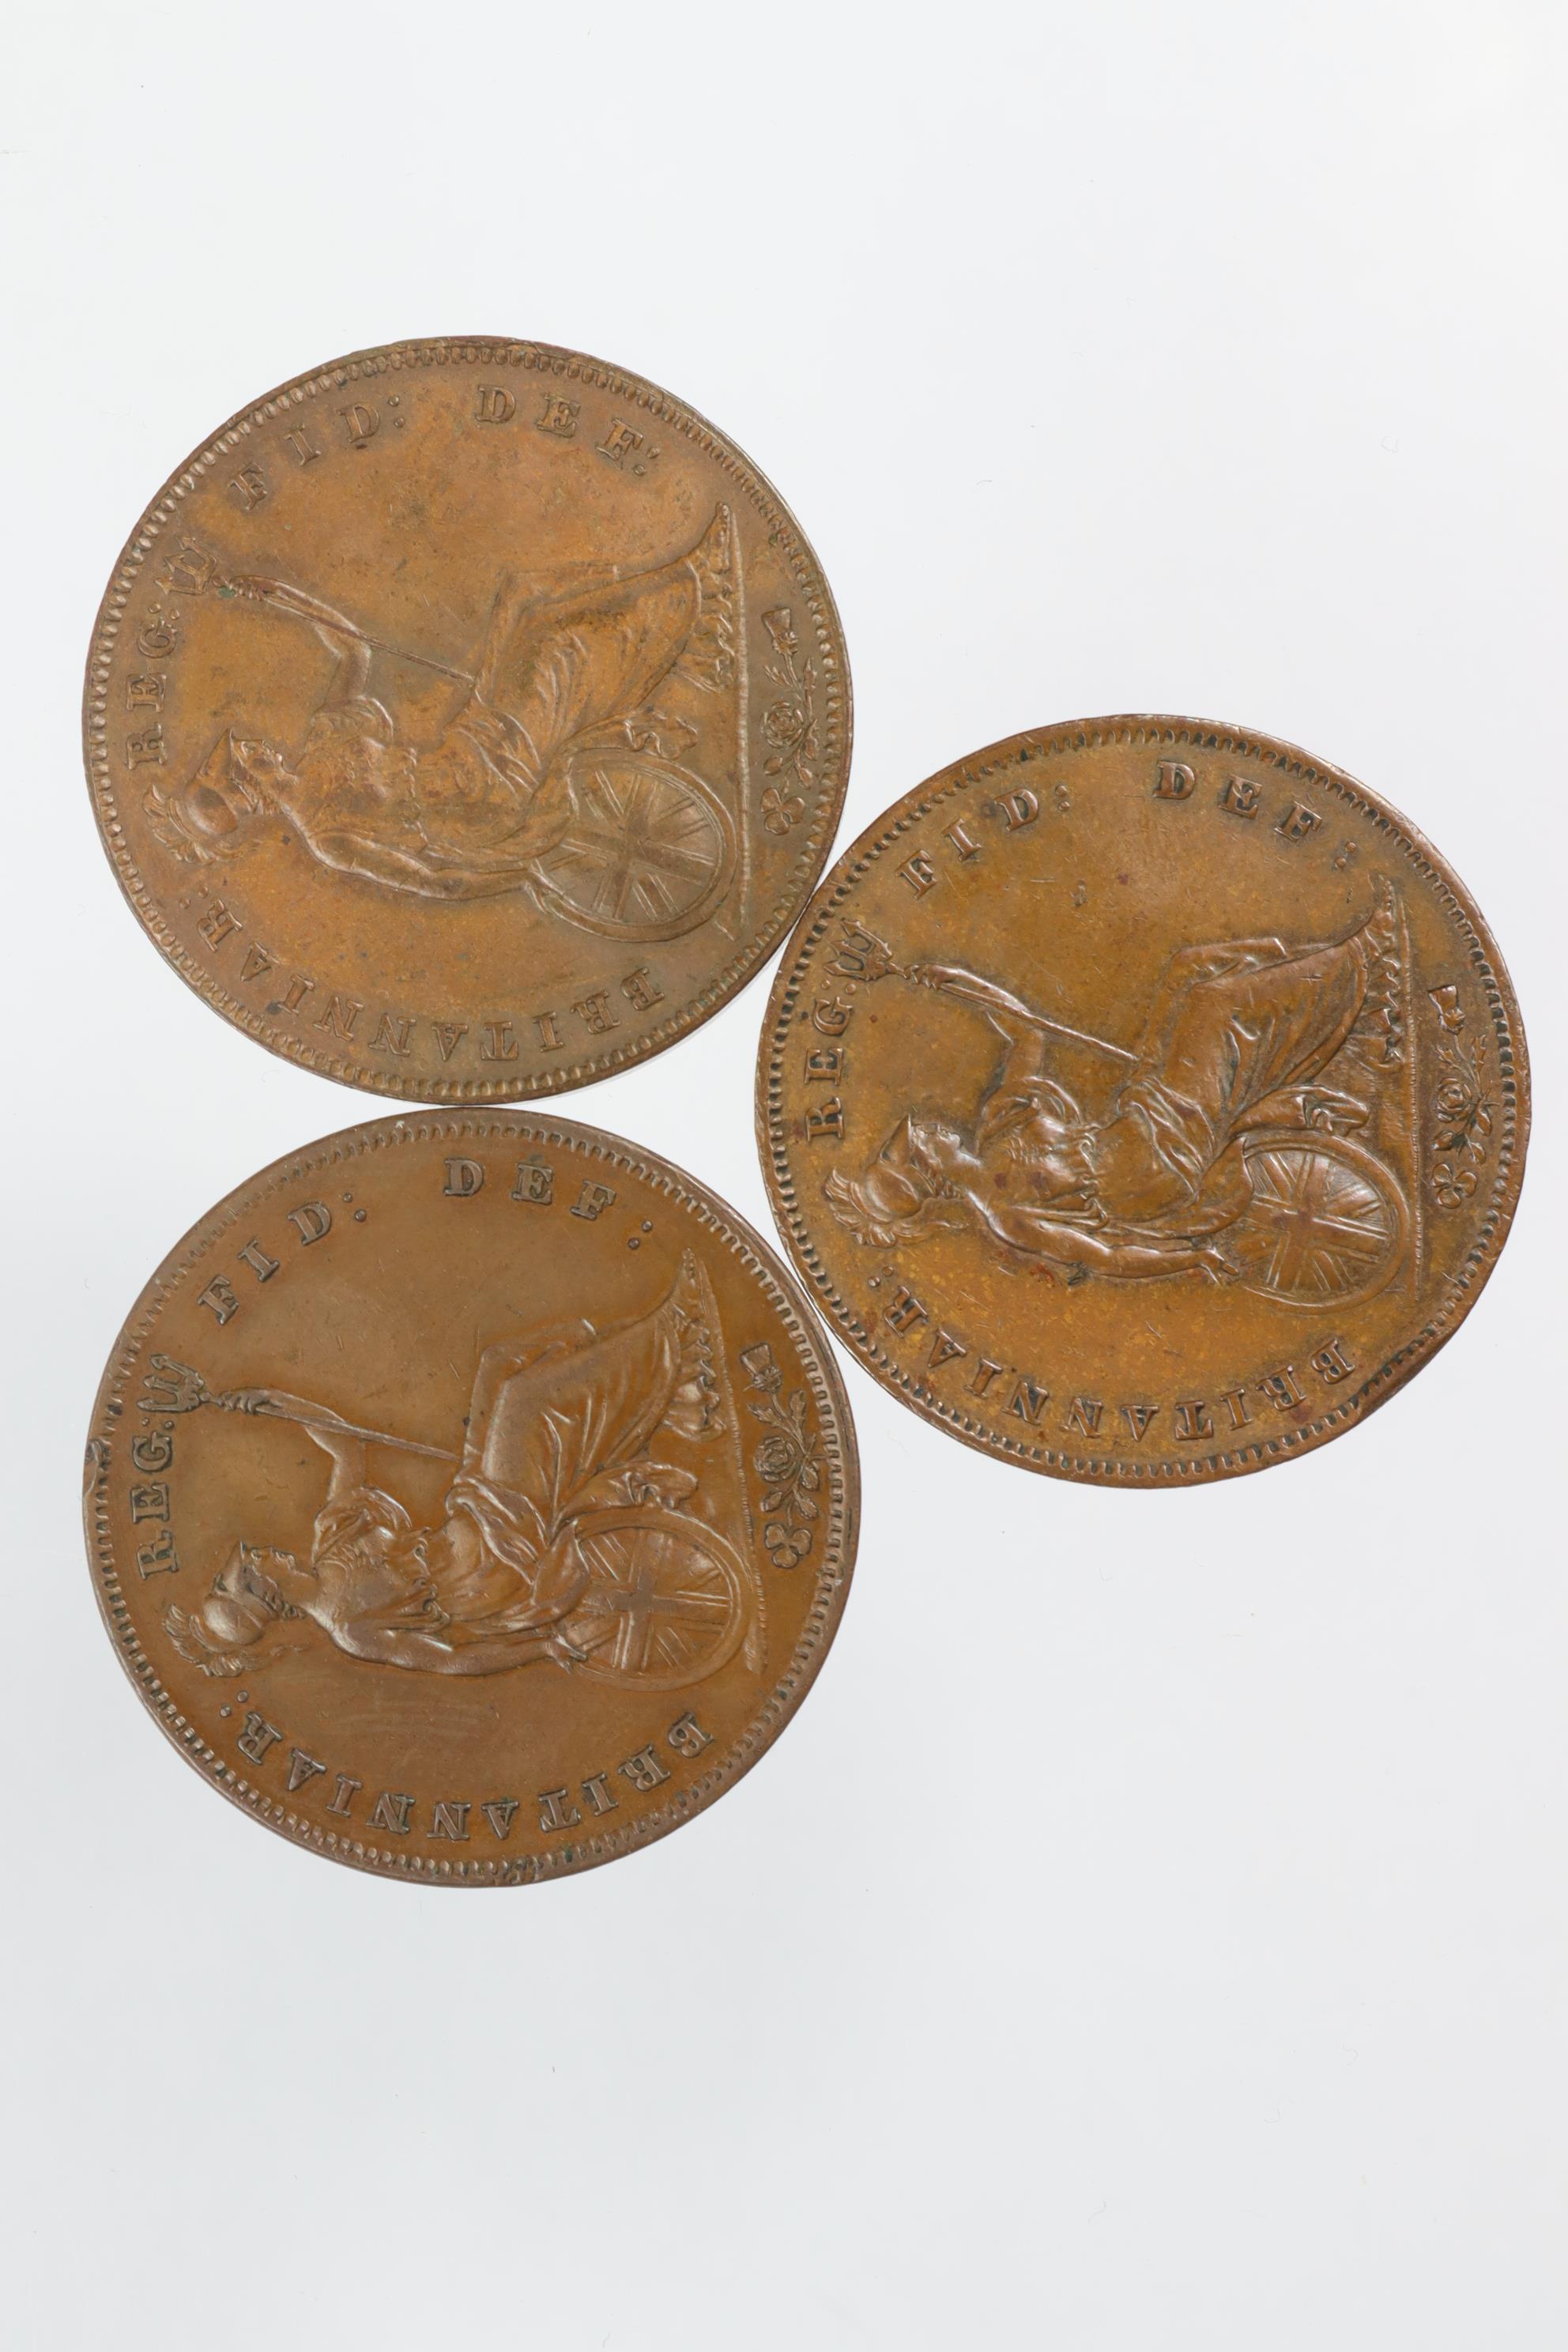 GB Pennies (3): 1848 OT GVF edge knock, 1855 OT GVF edge knock, and 1855 PT GVF+, trace lustre. - Image 2 of 2